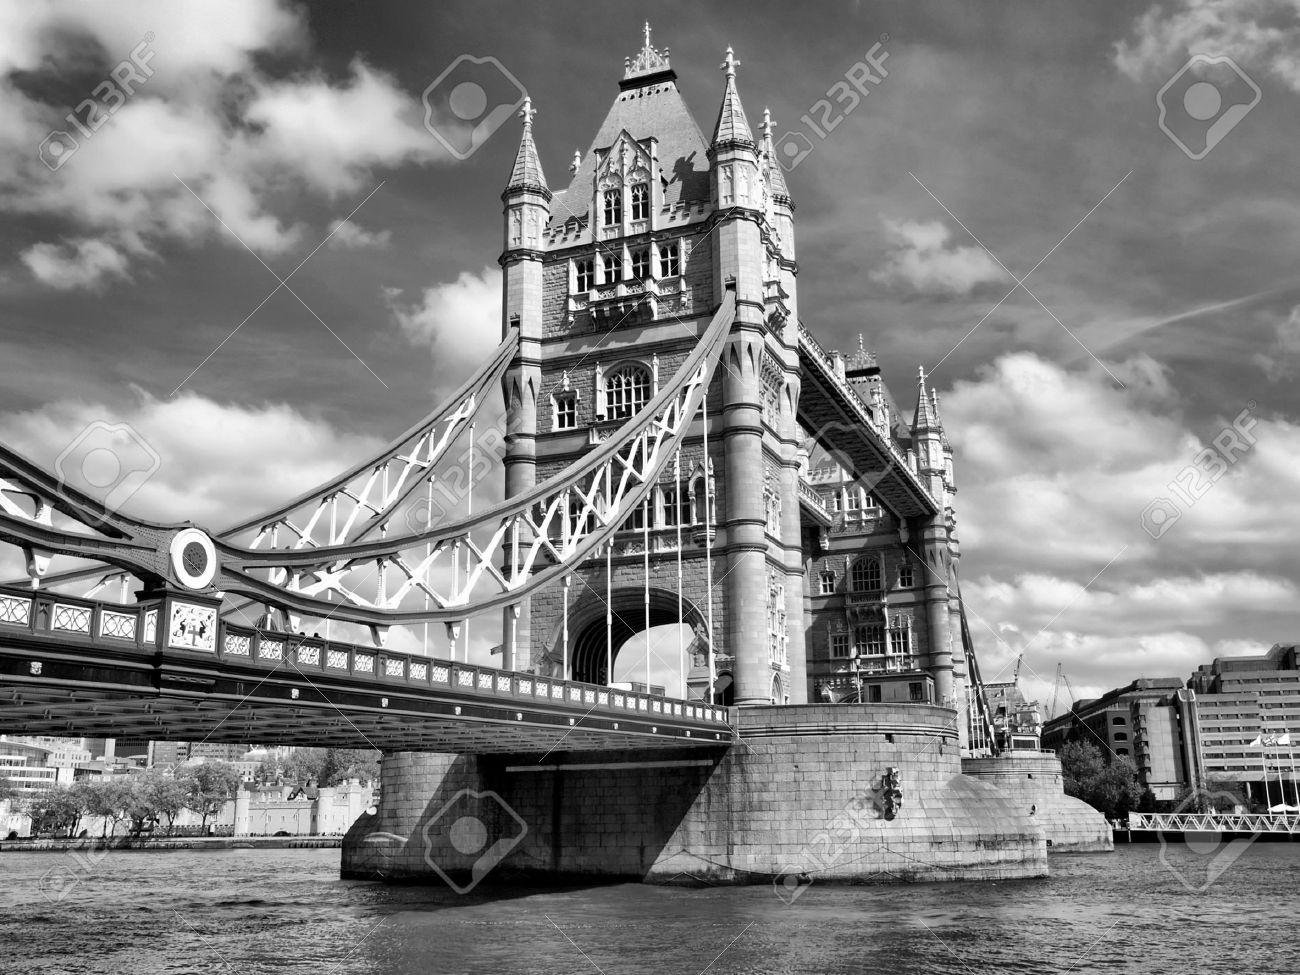 Tower Bridge on River Thames, London, UK - high dynamic range HDR - black and white Stock Photo - 8511276